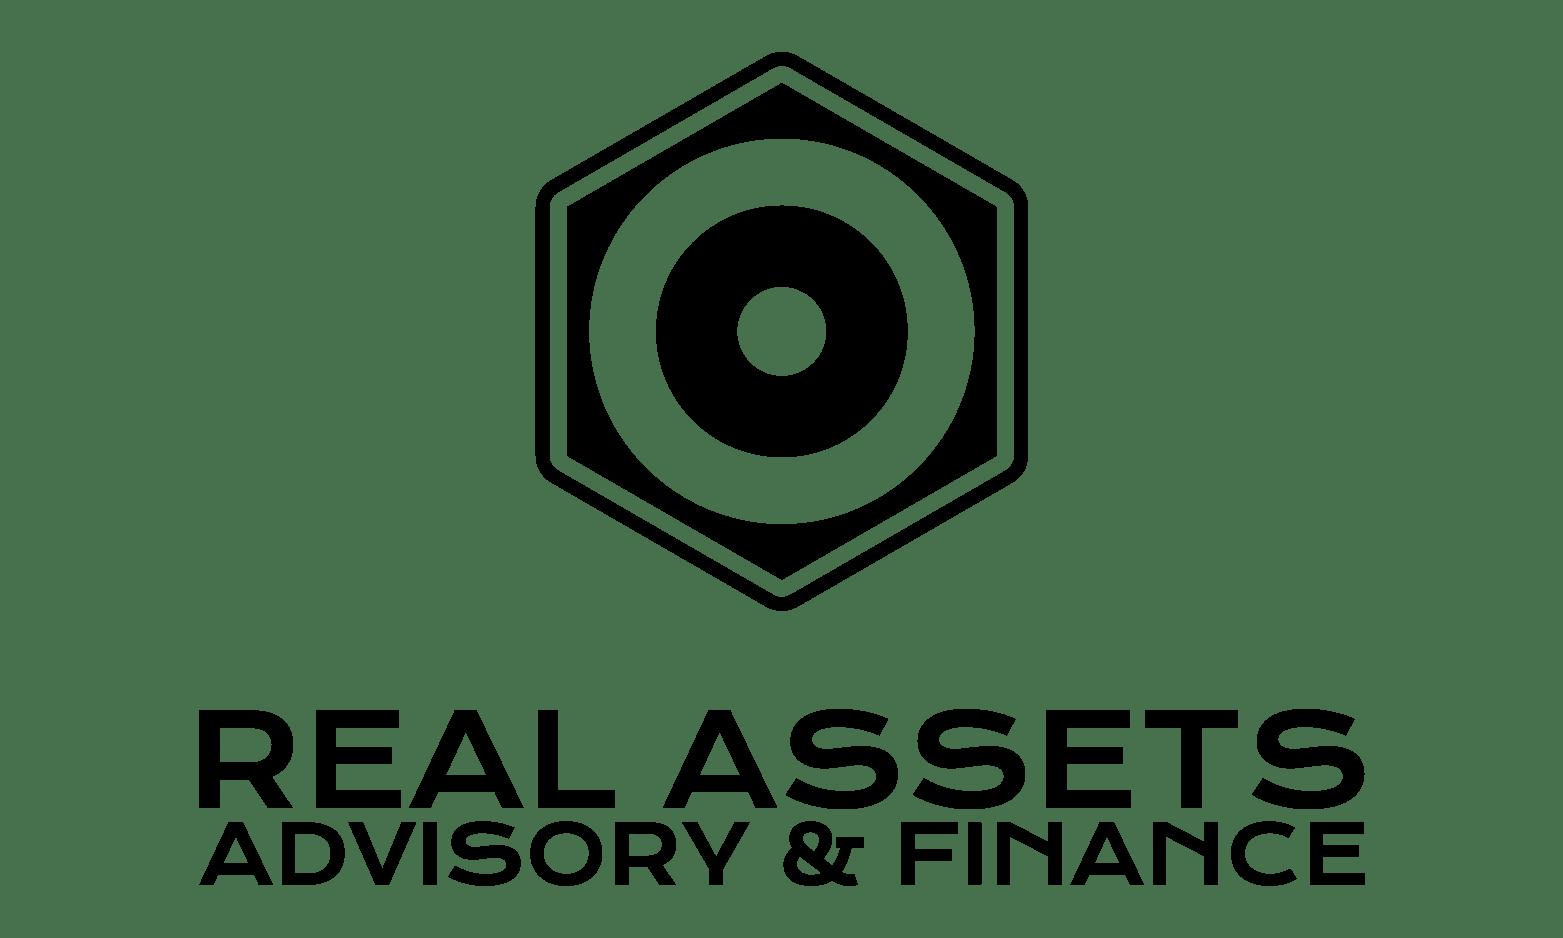 Real Assets Advisory & Finance